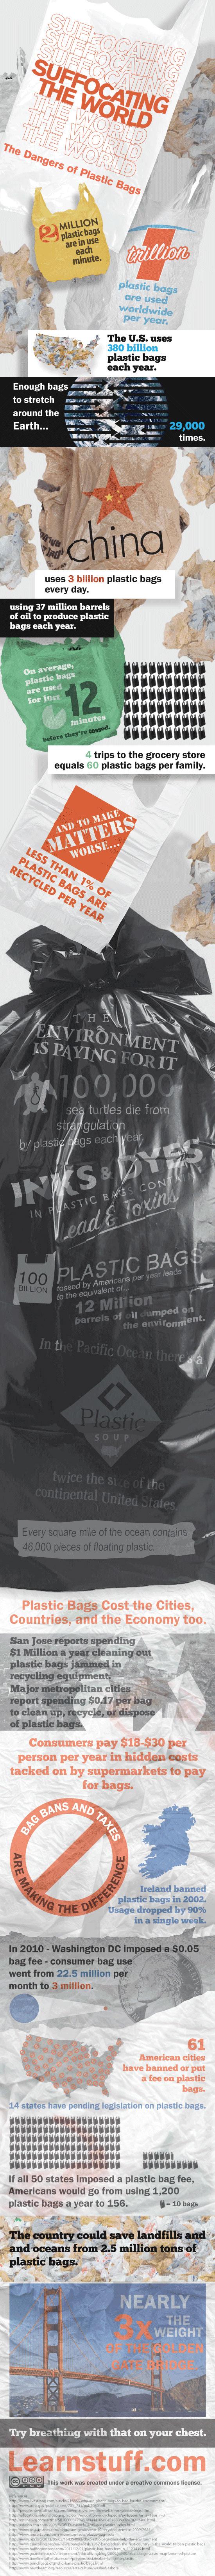 Plastic Bags Kill-Infographic